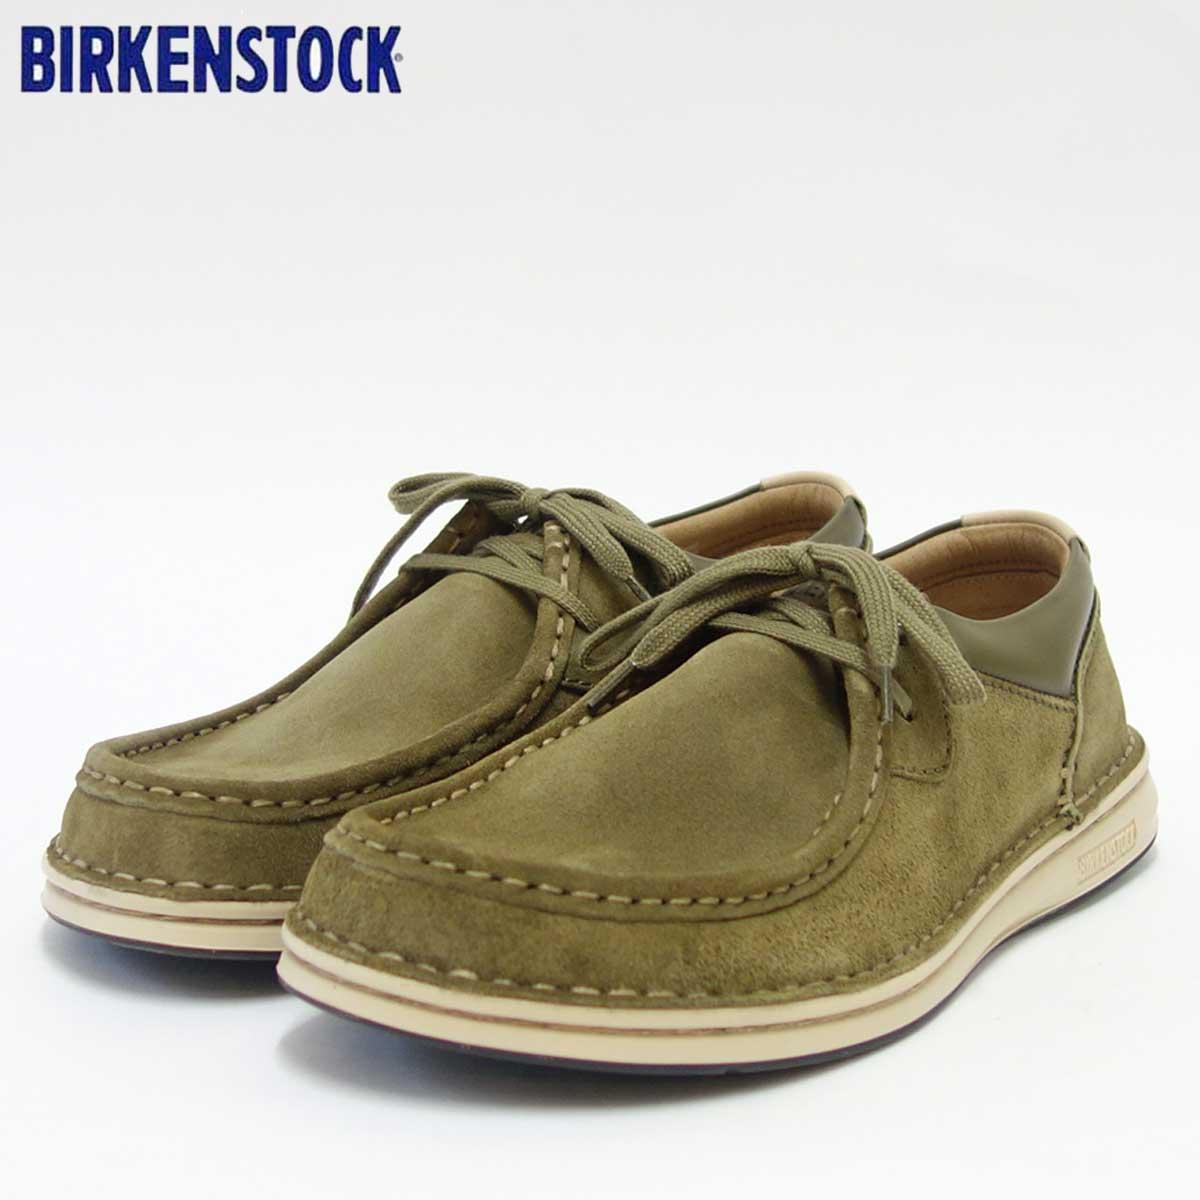 BIRKENSTOCK(ビルケンシュトック) PASADENA(パサデナ)メンズ 1008483(天然皮革/カーキ)ヨーロッパ生まれの快適シューズ(正規輸入品)「靴」